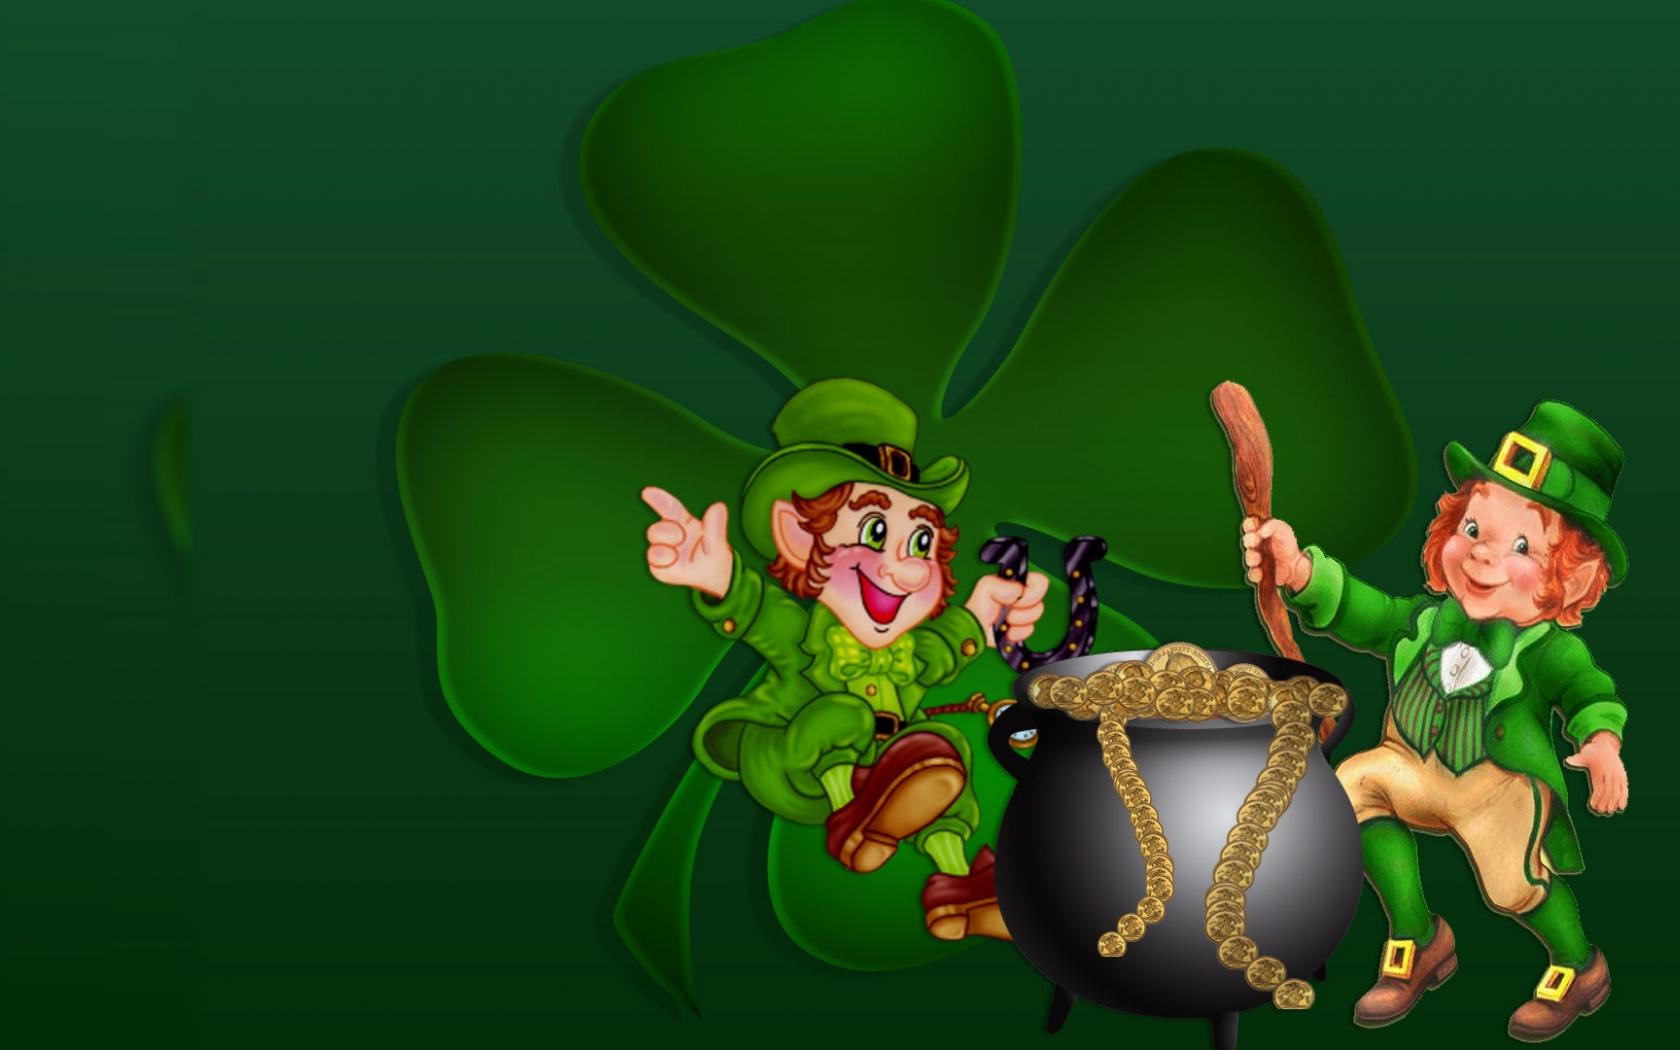 Free Download Animated St Patricks Day Wallpaper Happy Saint